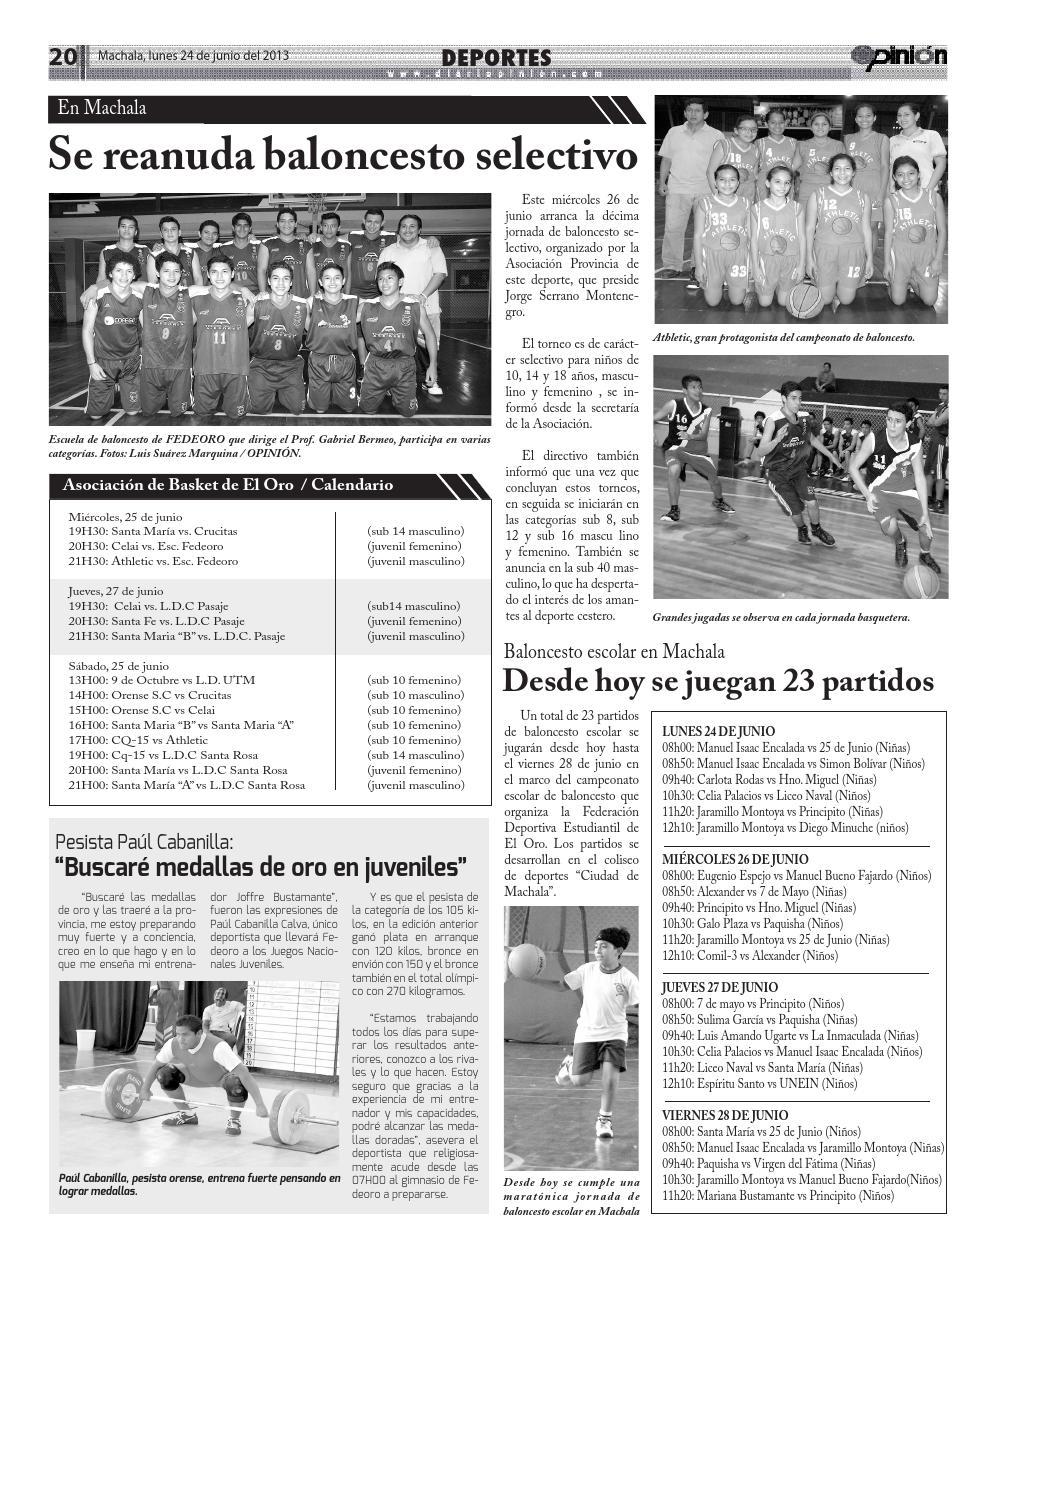 Impreso 24 06 13 by Diario Opinion - issuu